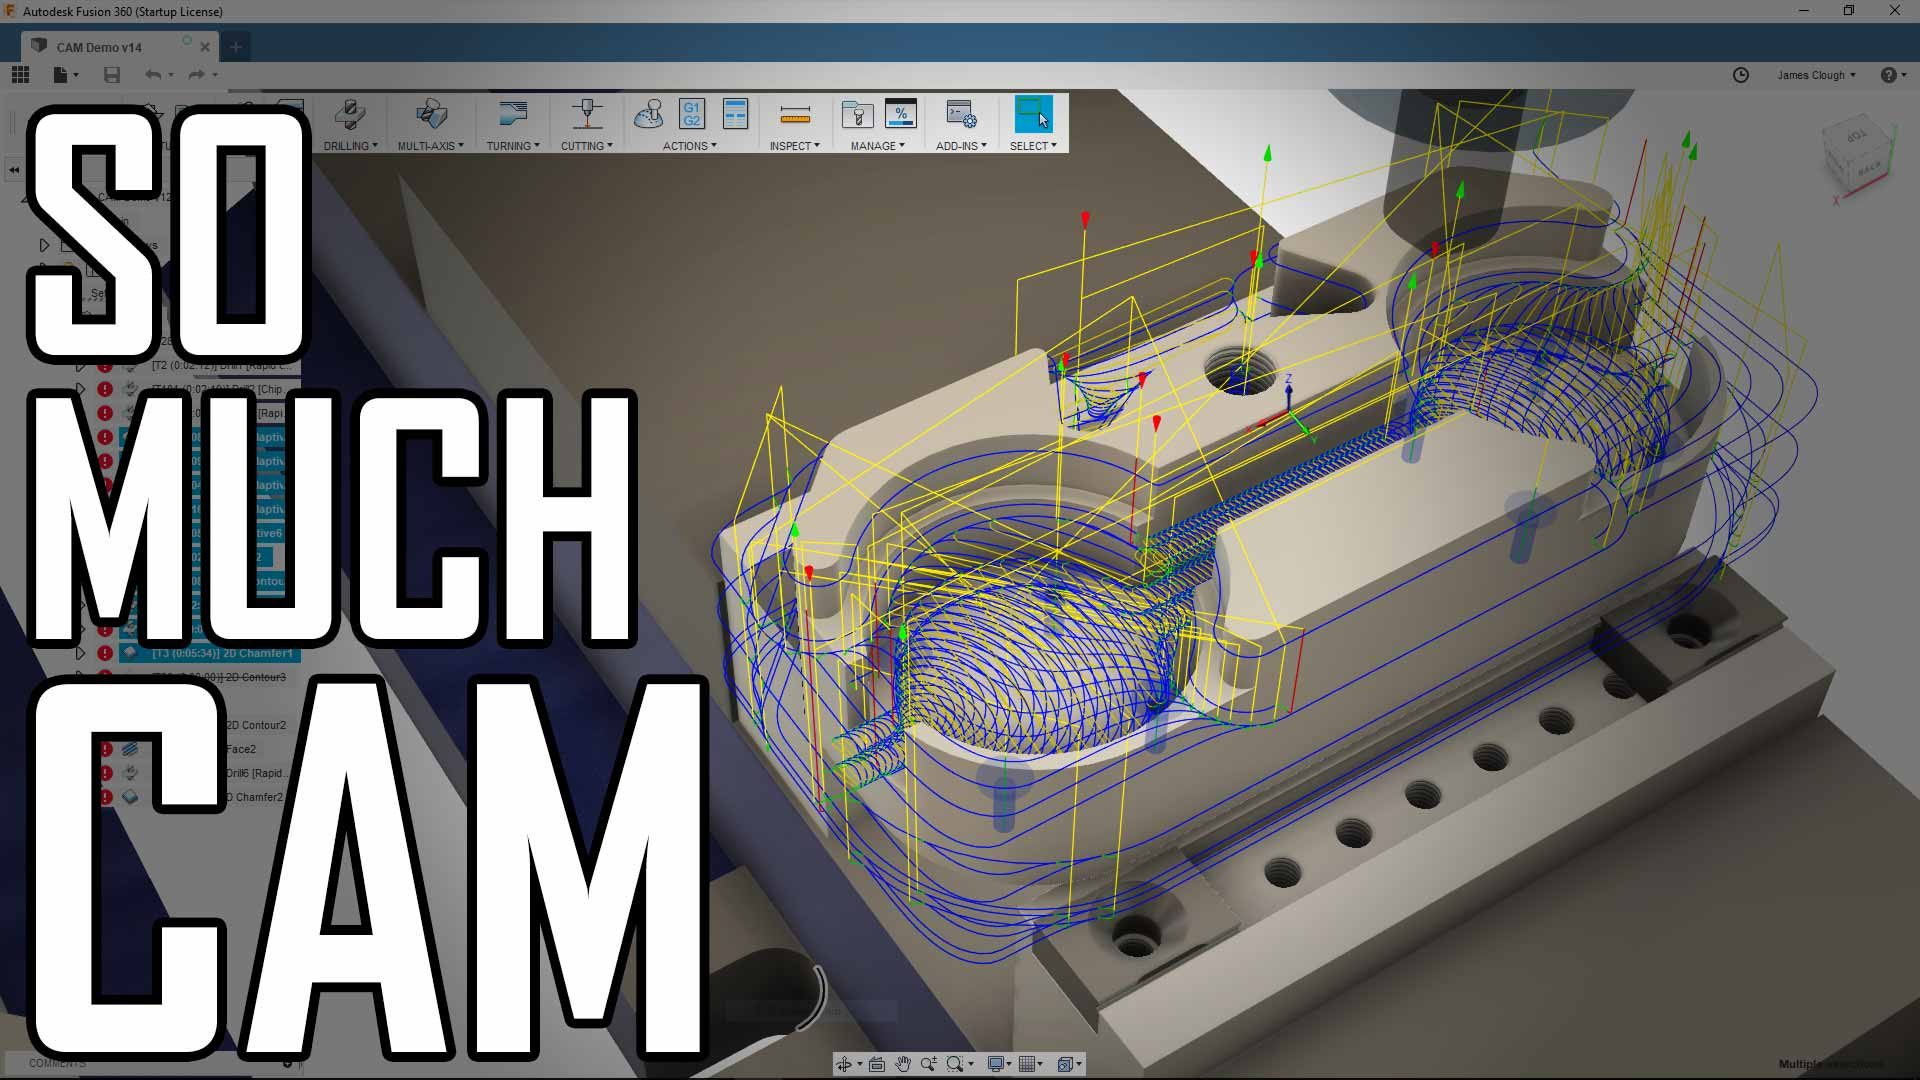 Toolpost Dial Indicator Part 5: Fusion 360 CAM Deep Dive